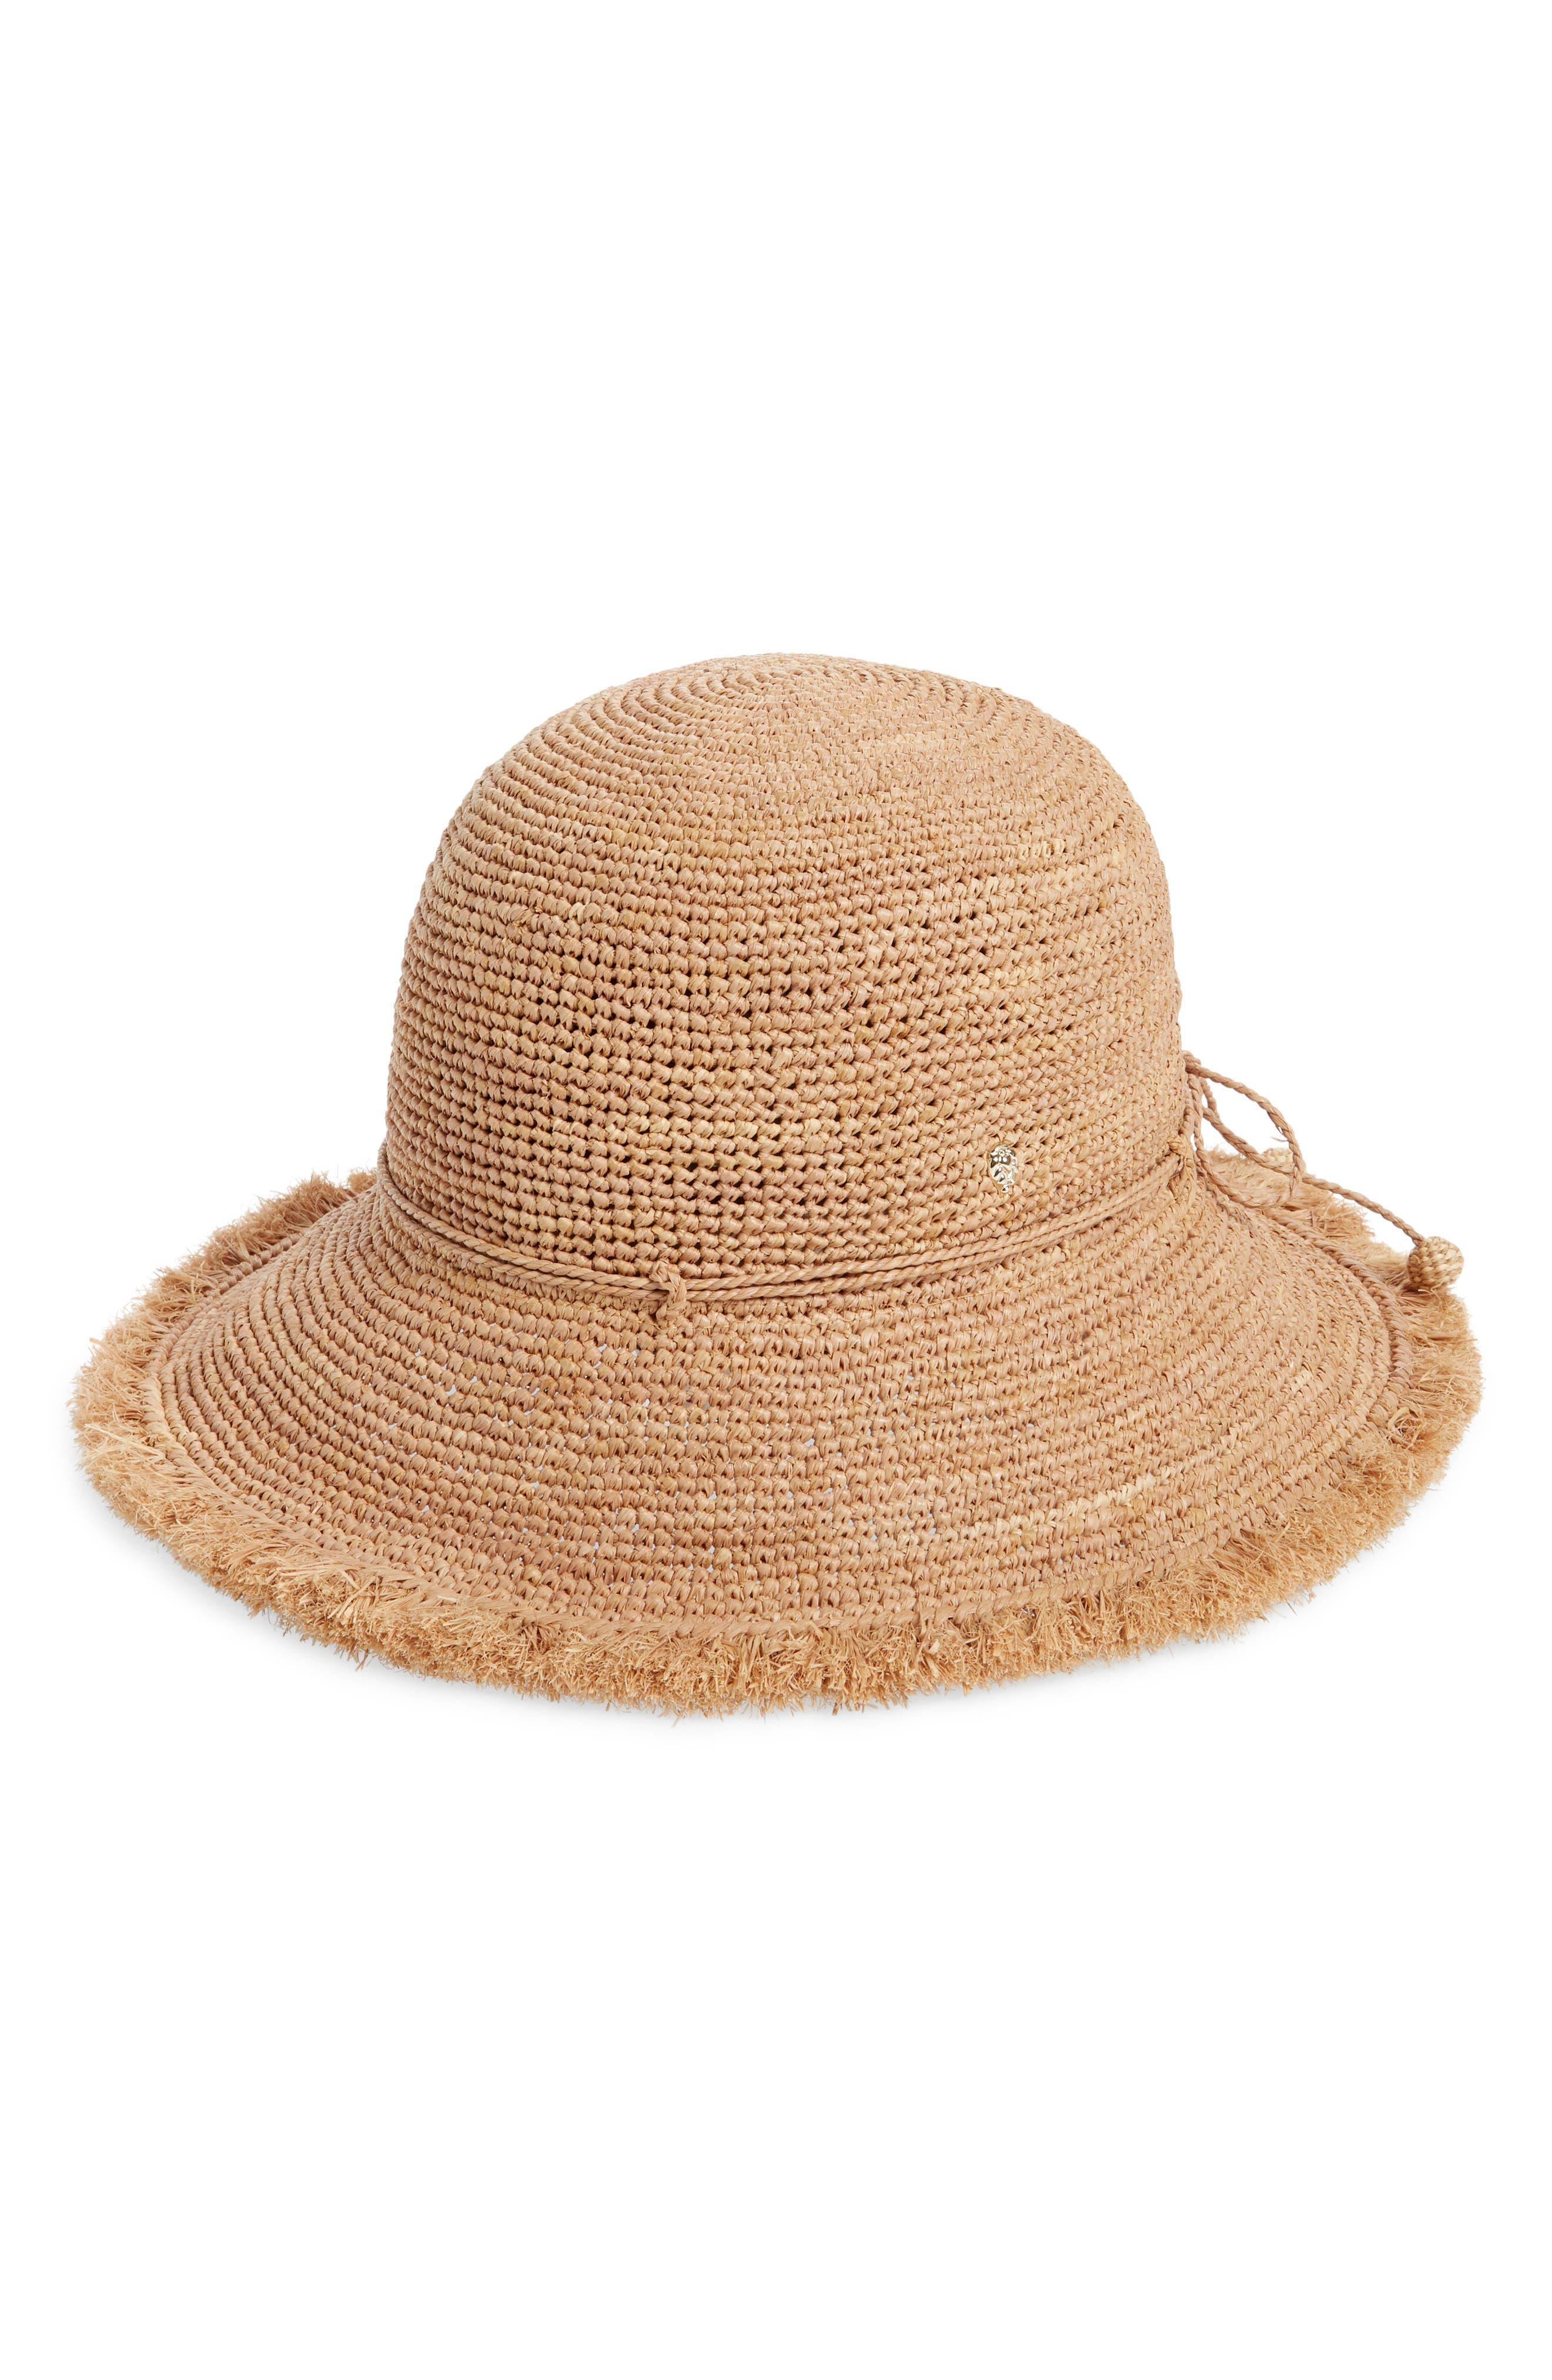 Emmie 9 Packable Raffia Hat